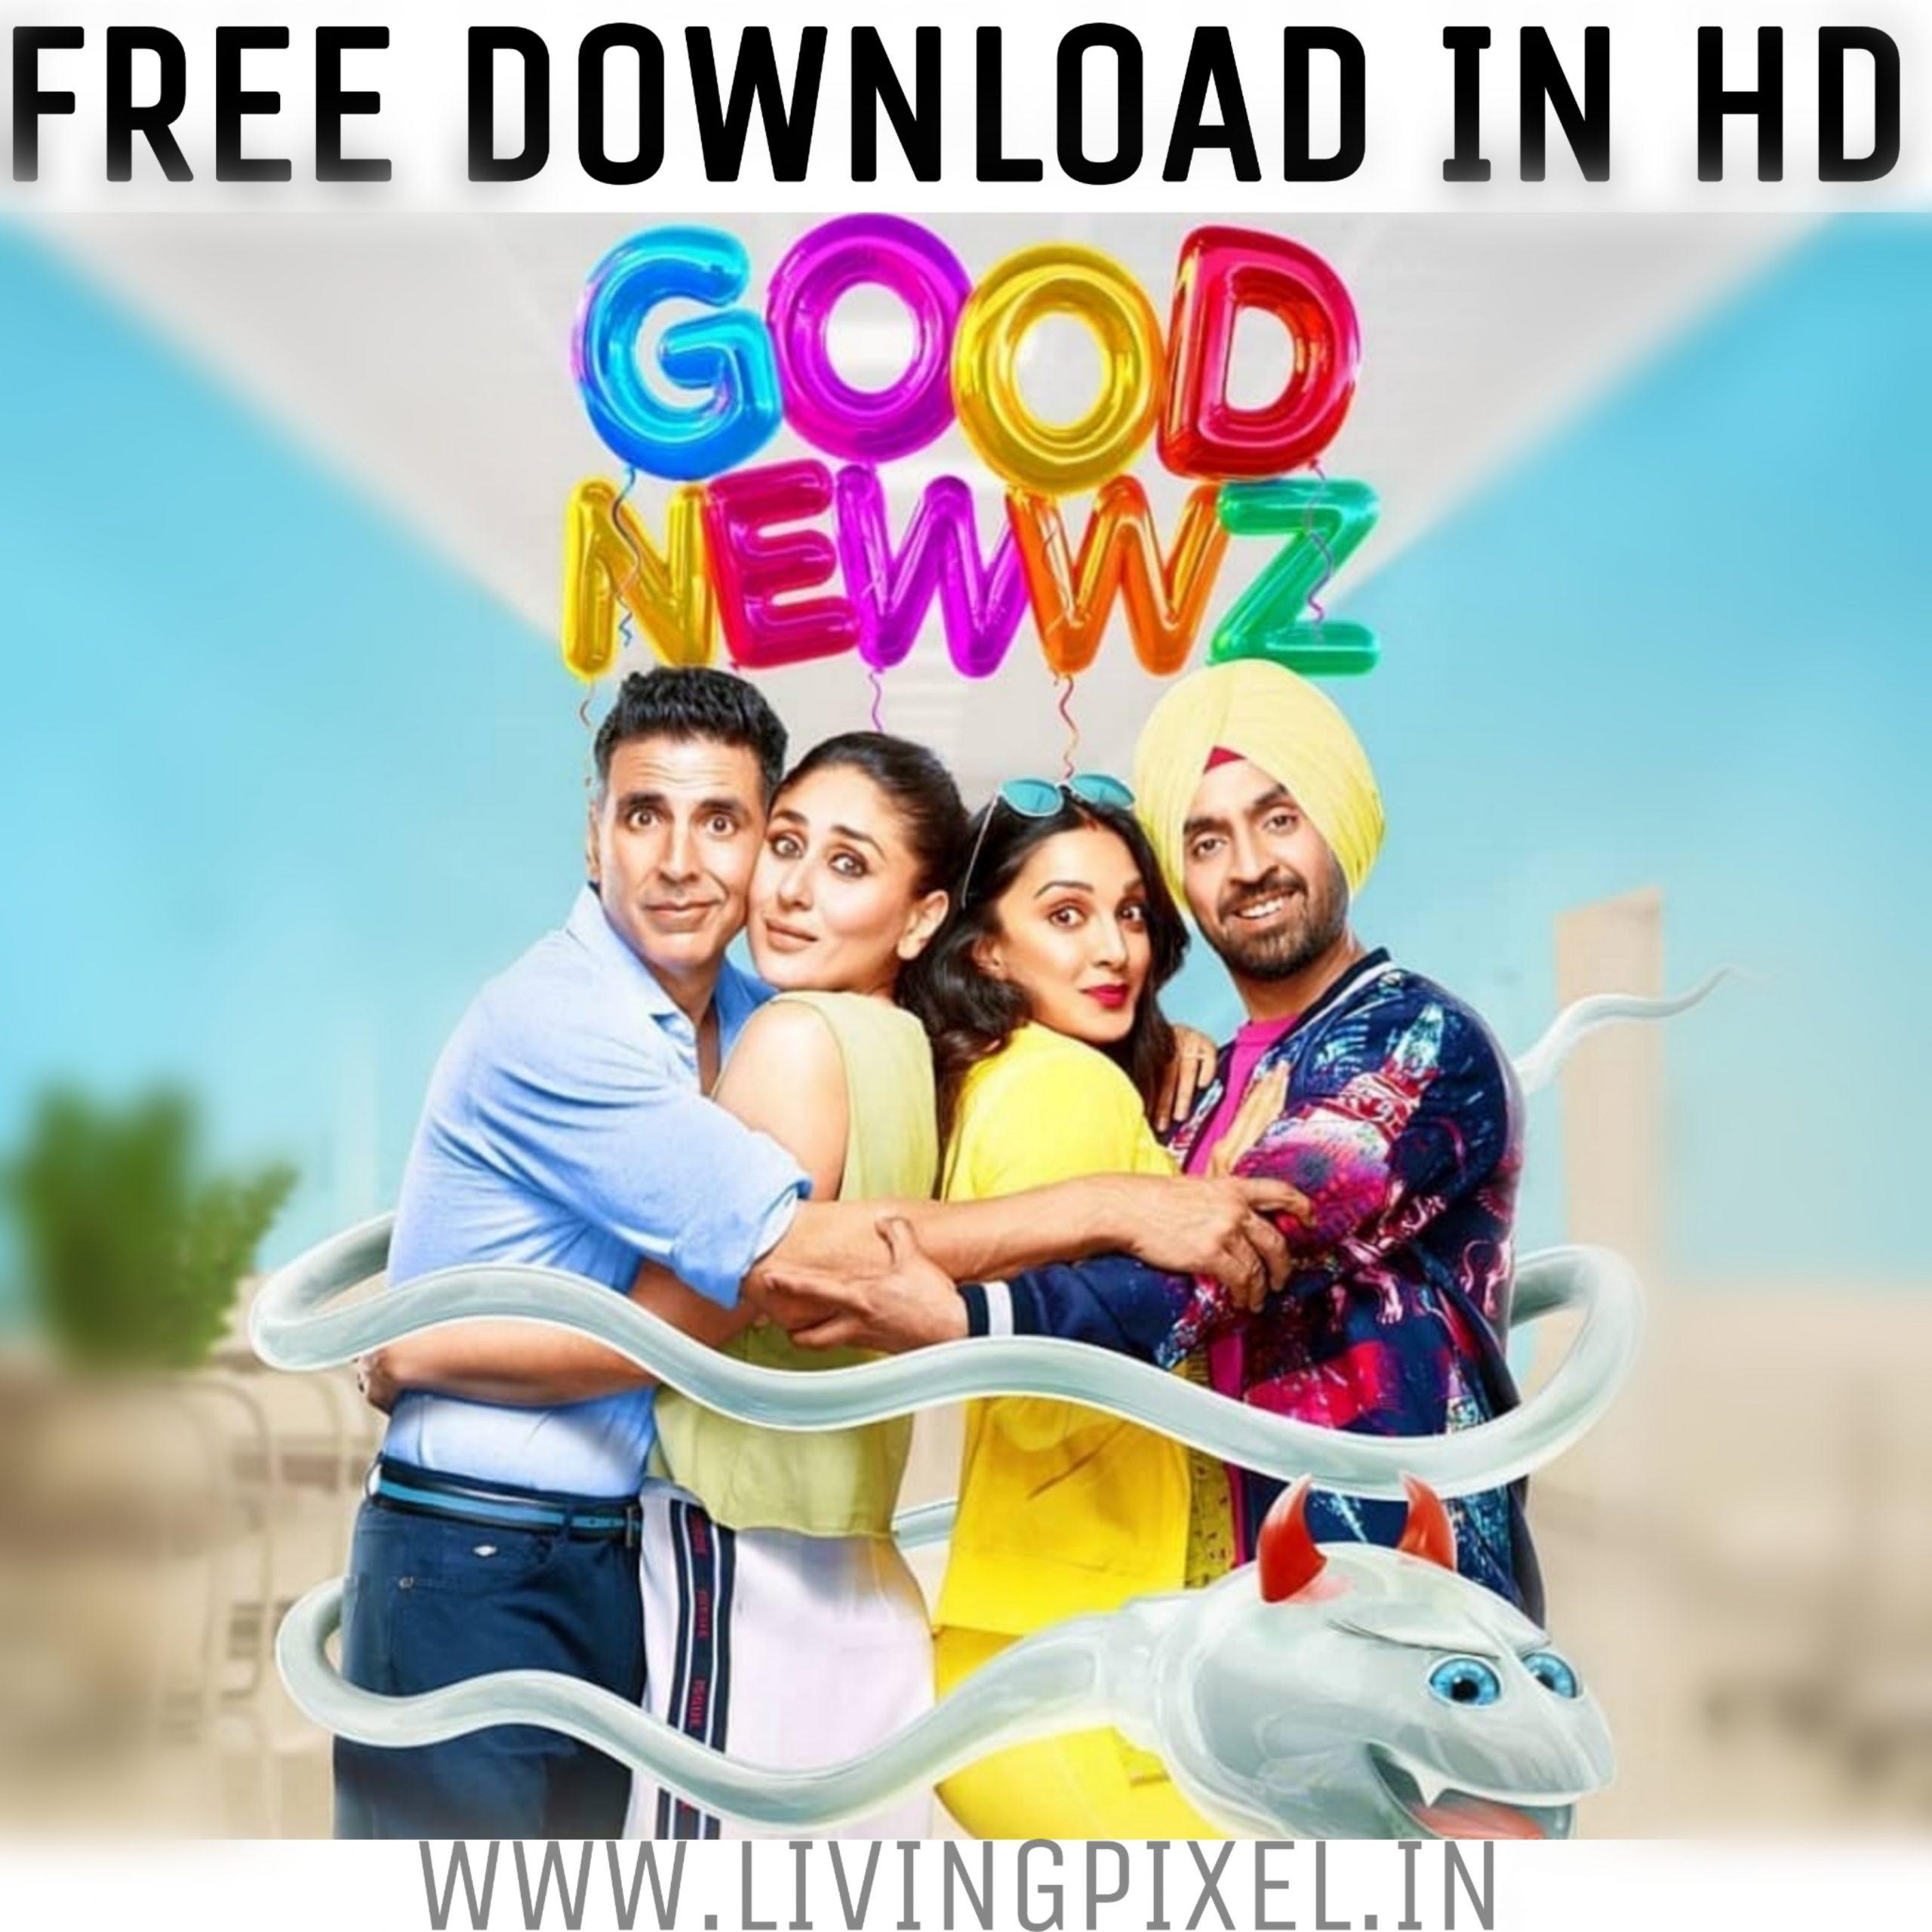 Good Newwz full movie download Worldfree4u in HD